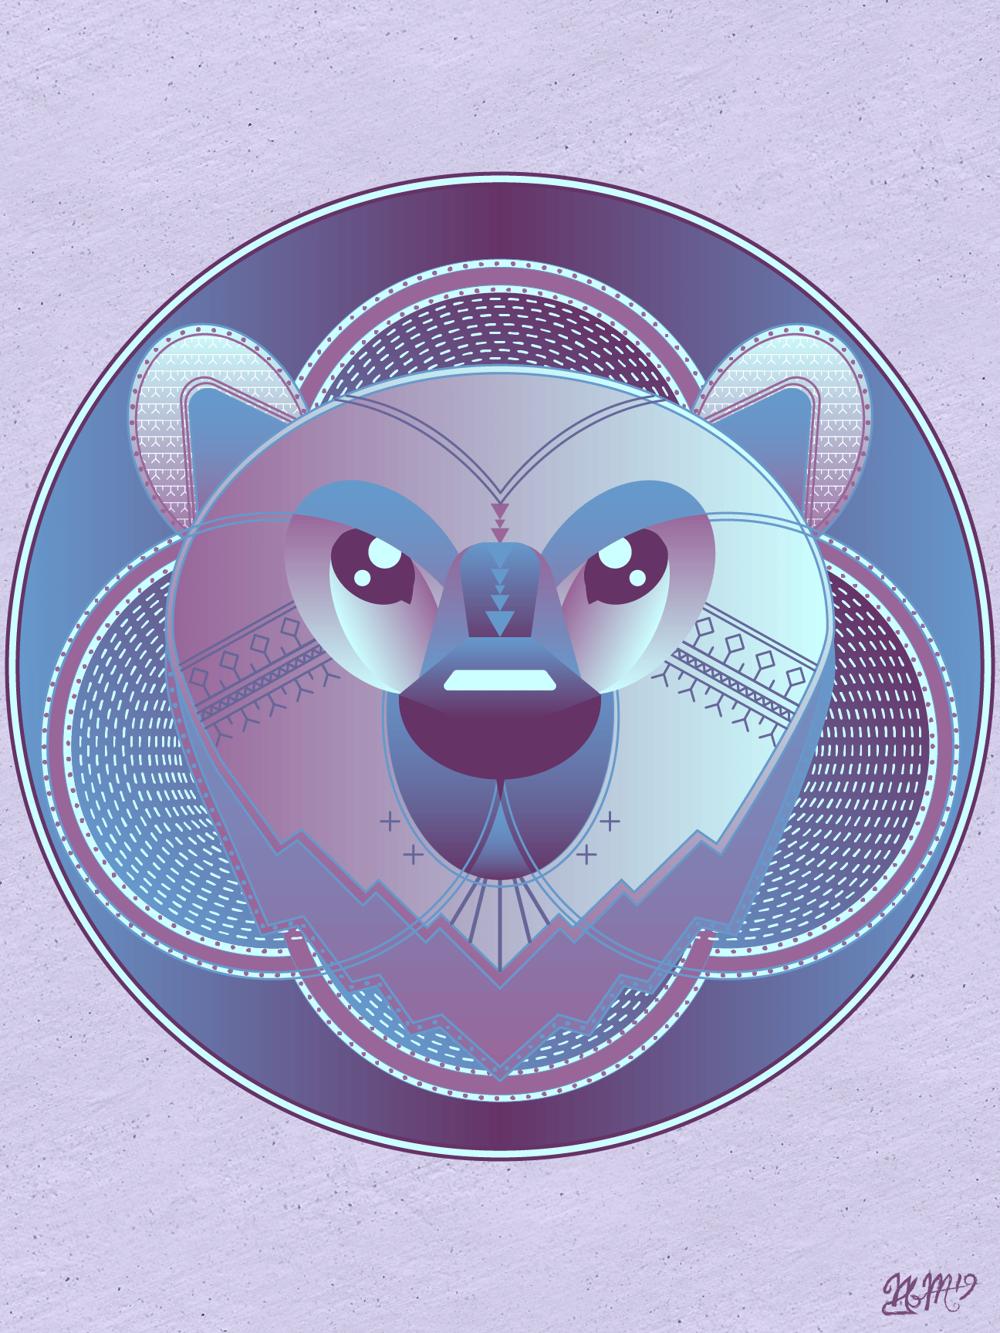 Polar Bear - image 4 - student project